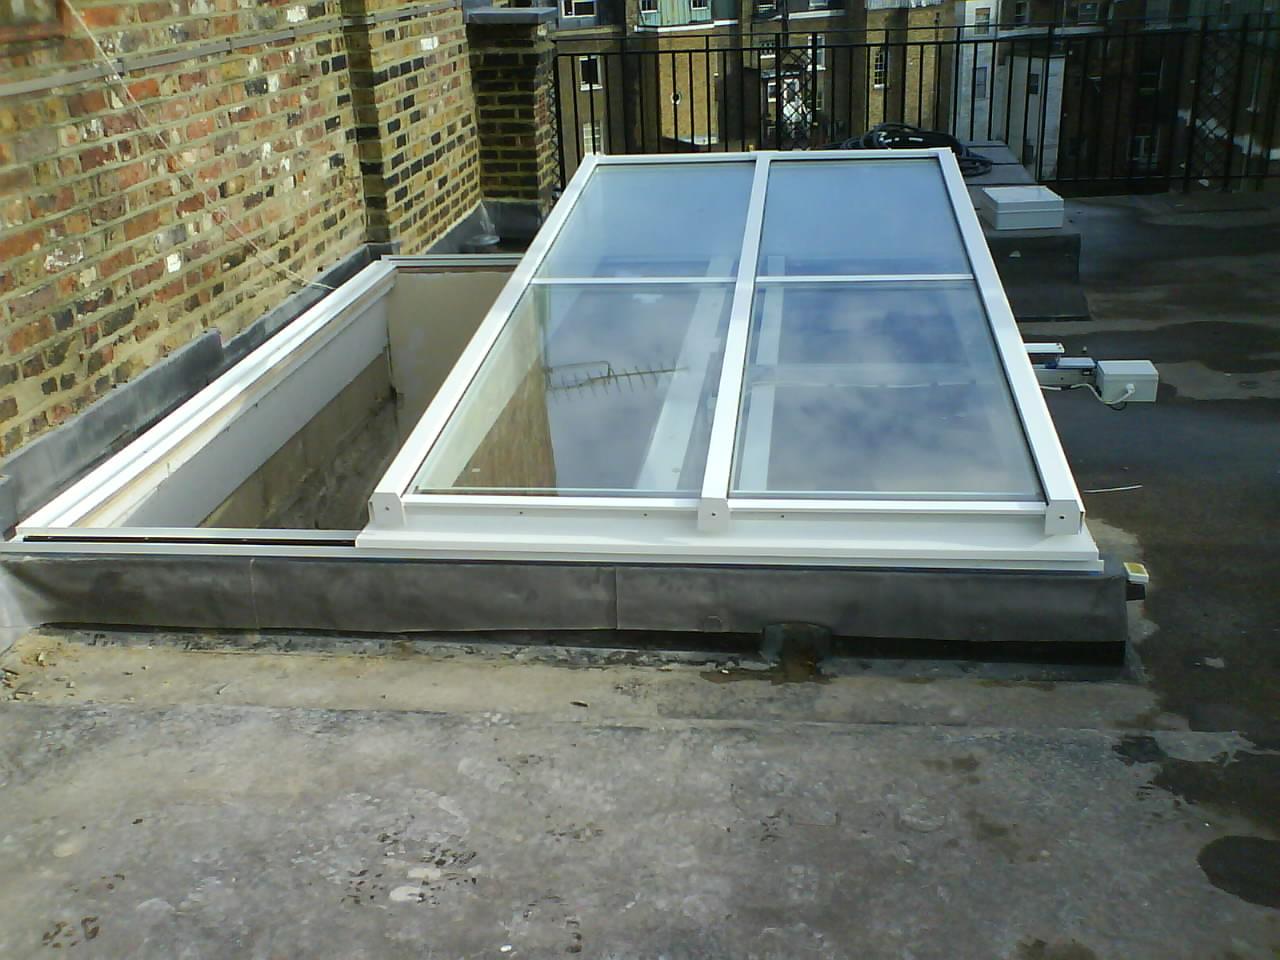 DOK Single Pitch Semi Retracting, Slide Open Roof Lantern, Rooflight, Skylight, Glazed Roof